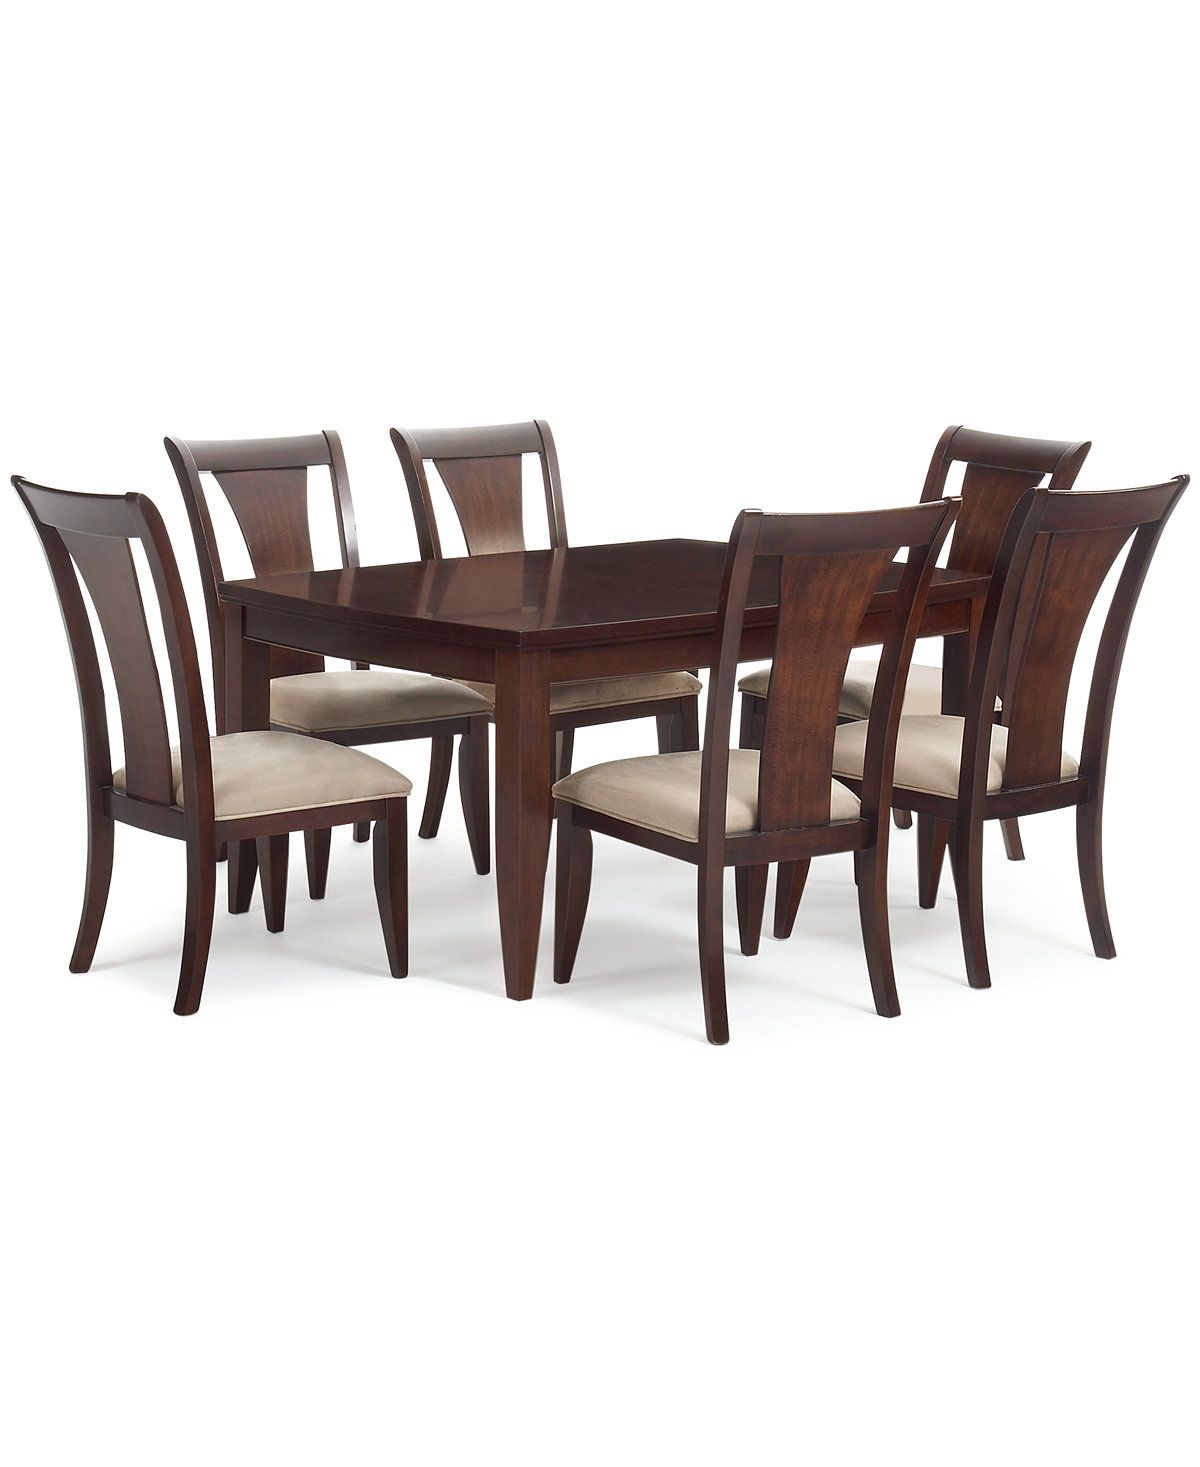 Metropolitan Brown/Espresso 6-Piece Dining Set with Table ...